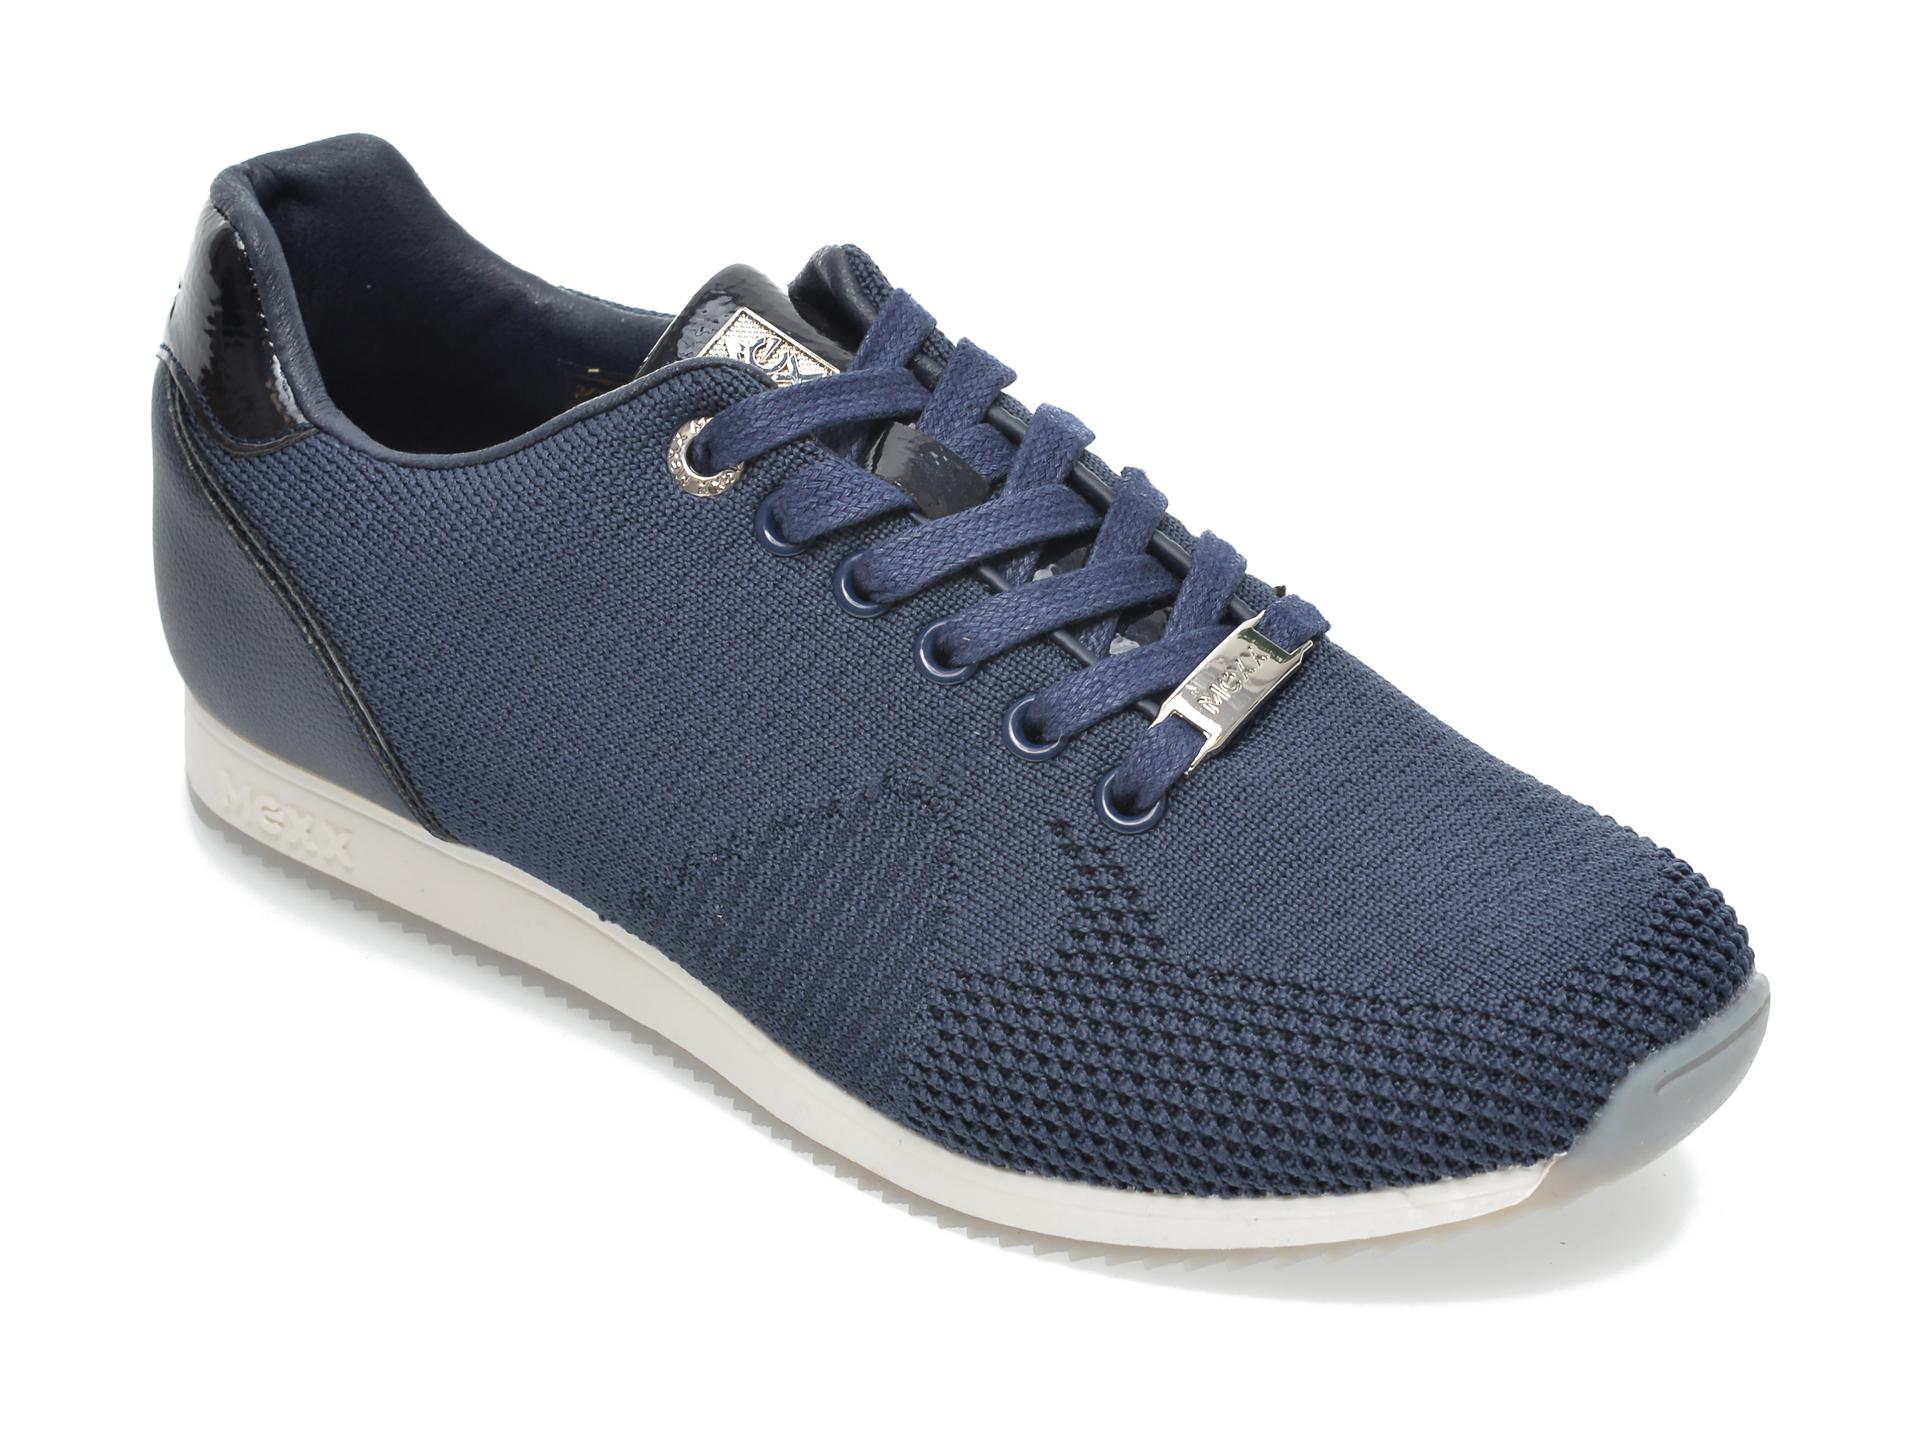 Pantofi Sport Mexx Bleumarin, K0181, Din Material Textil Si Piele Ecologica